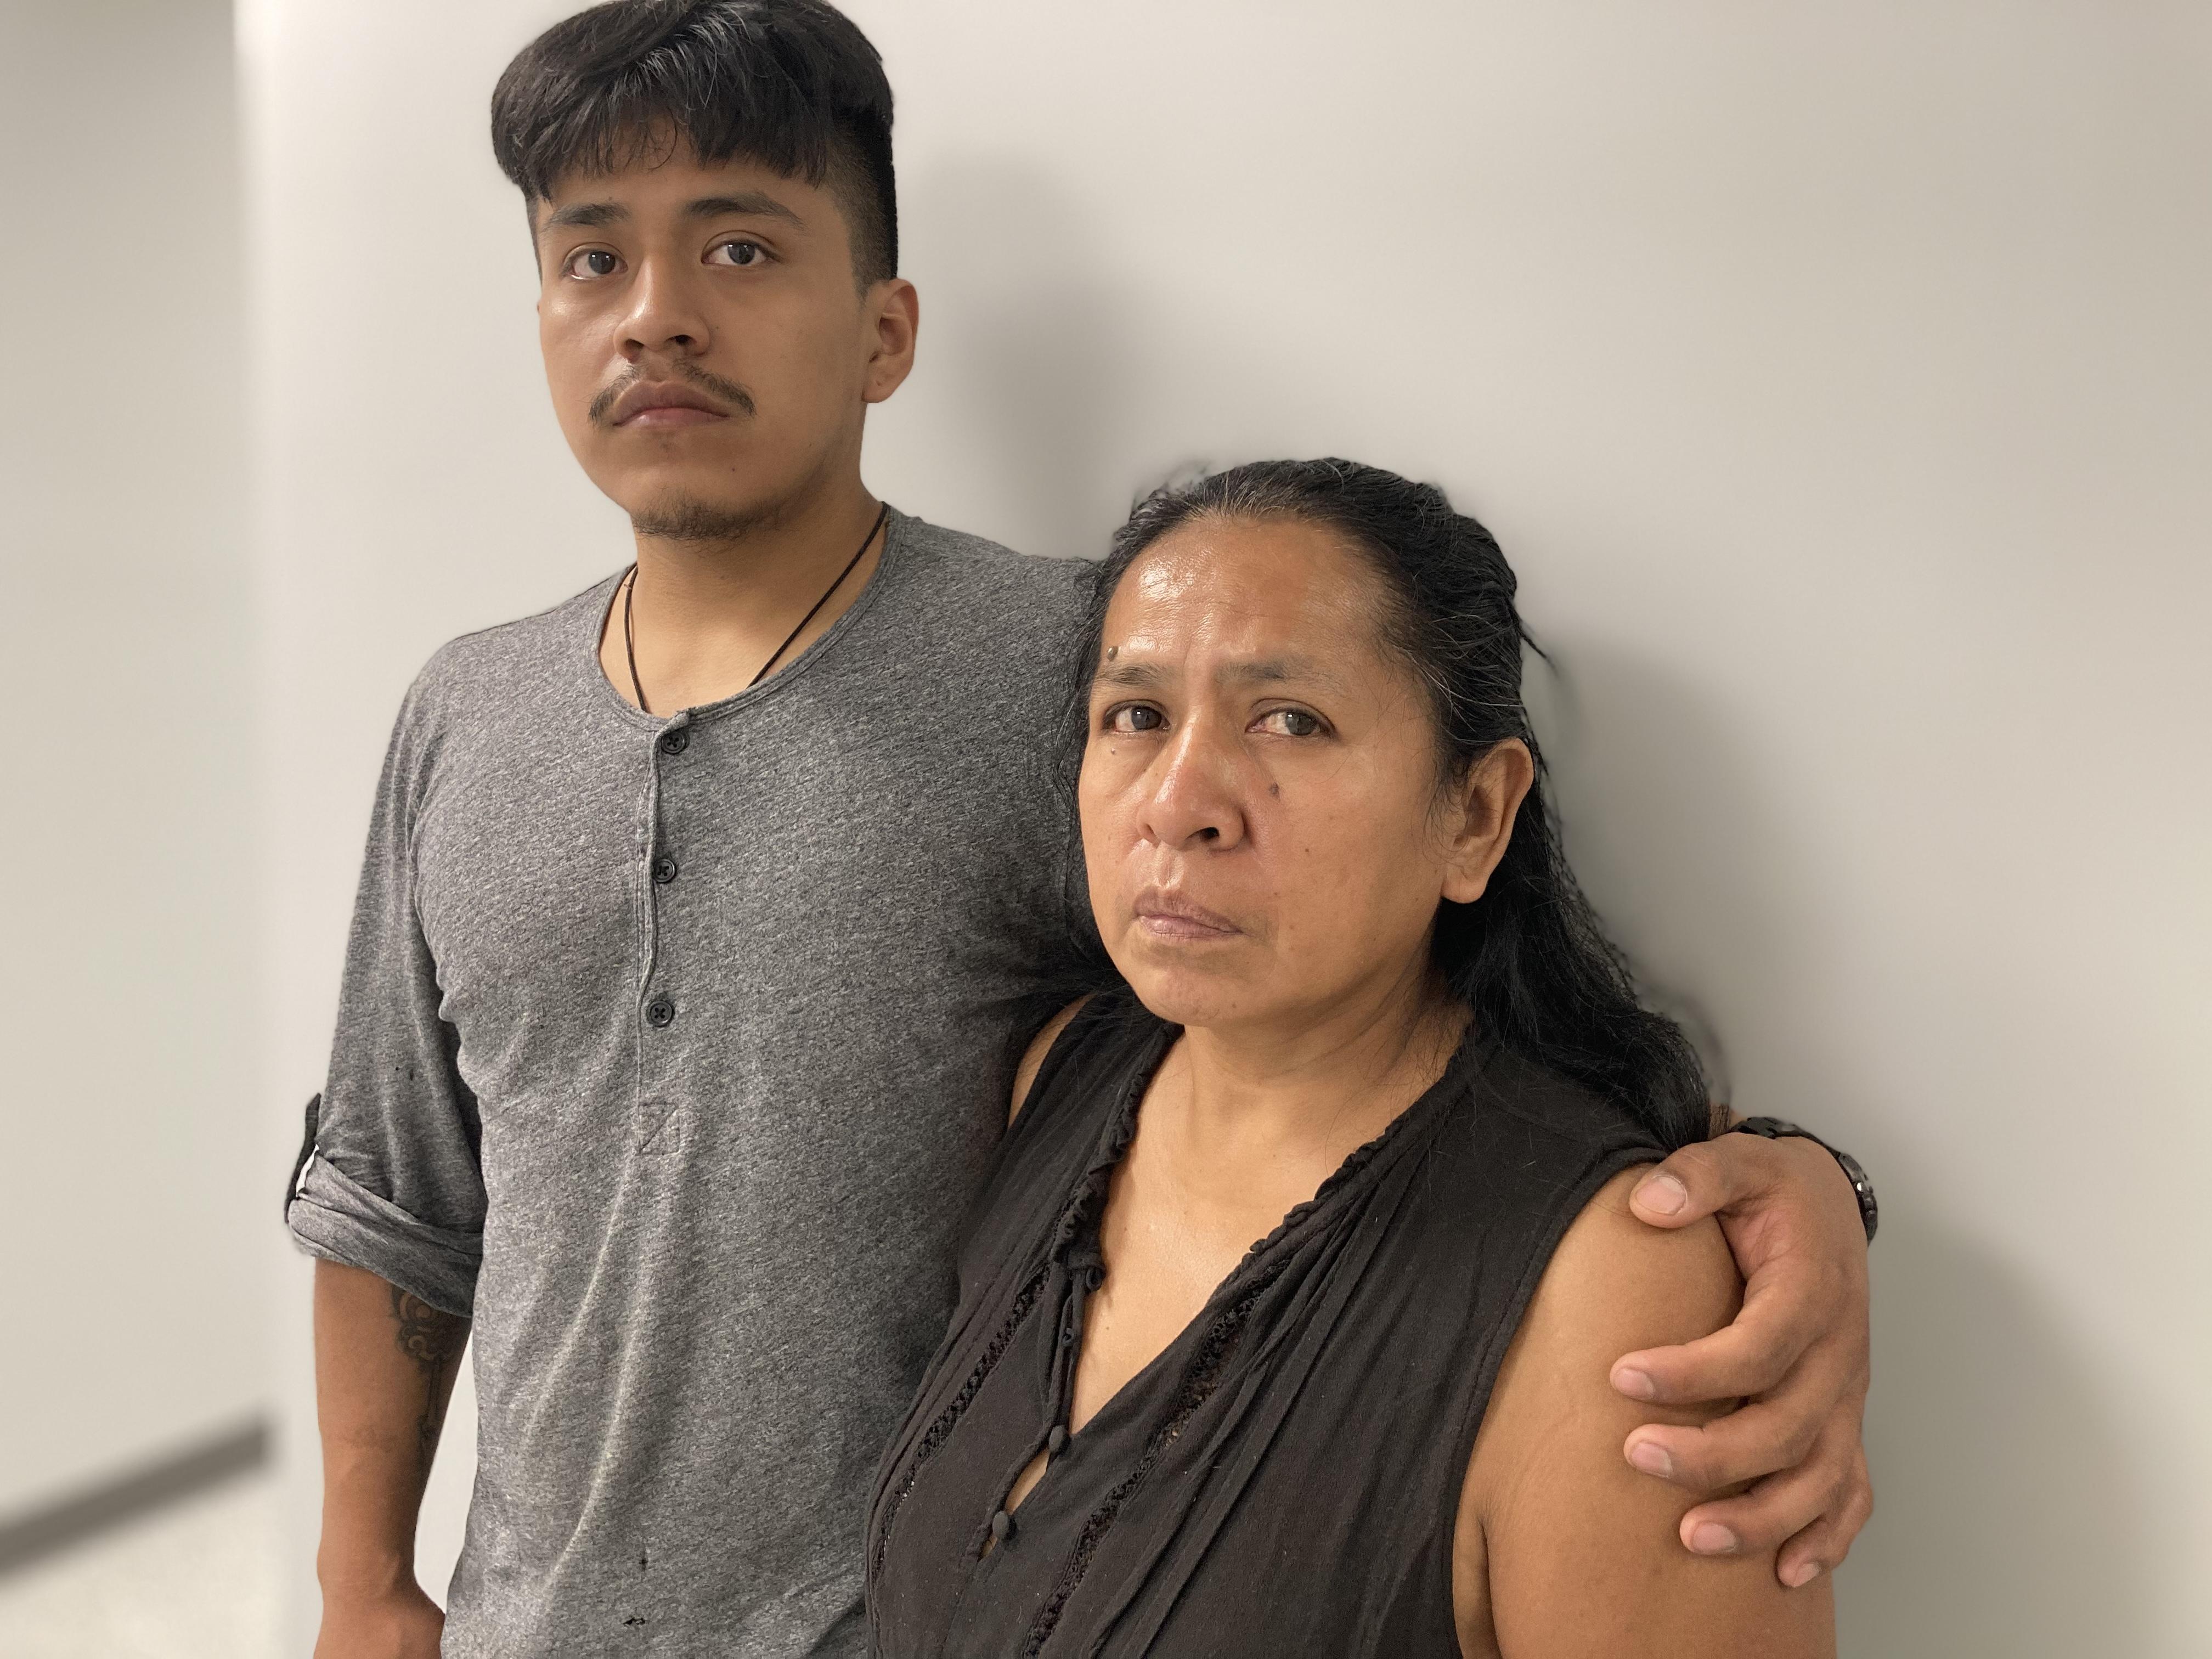 Luz Gualman and her son Francisco Guallpa